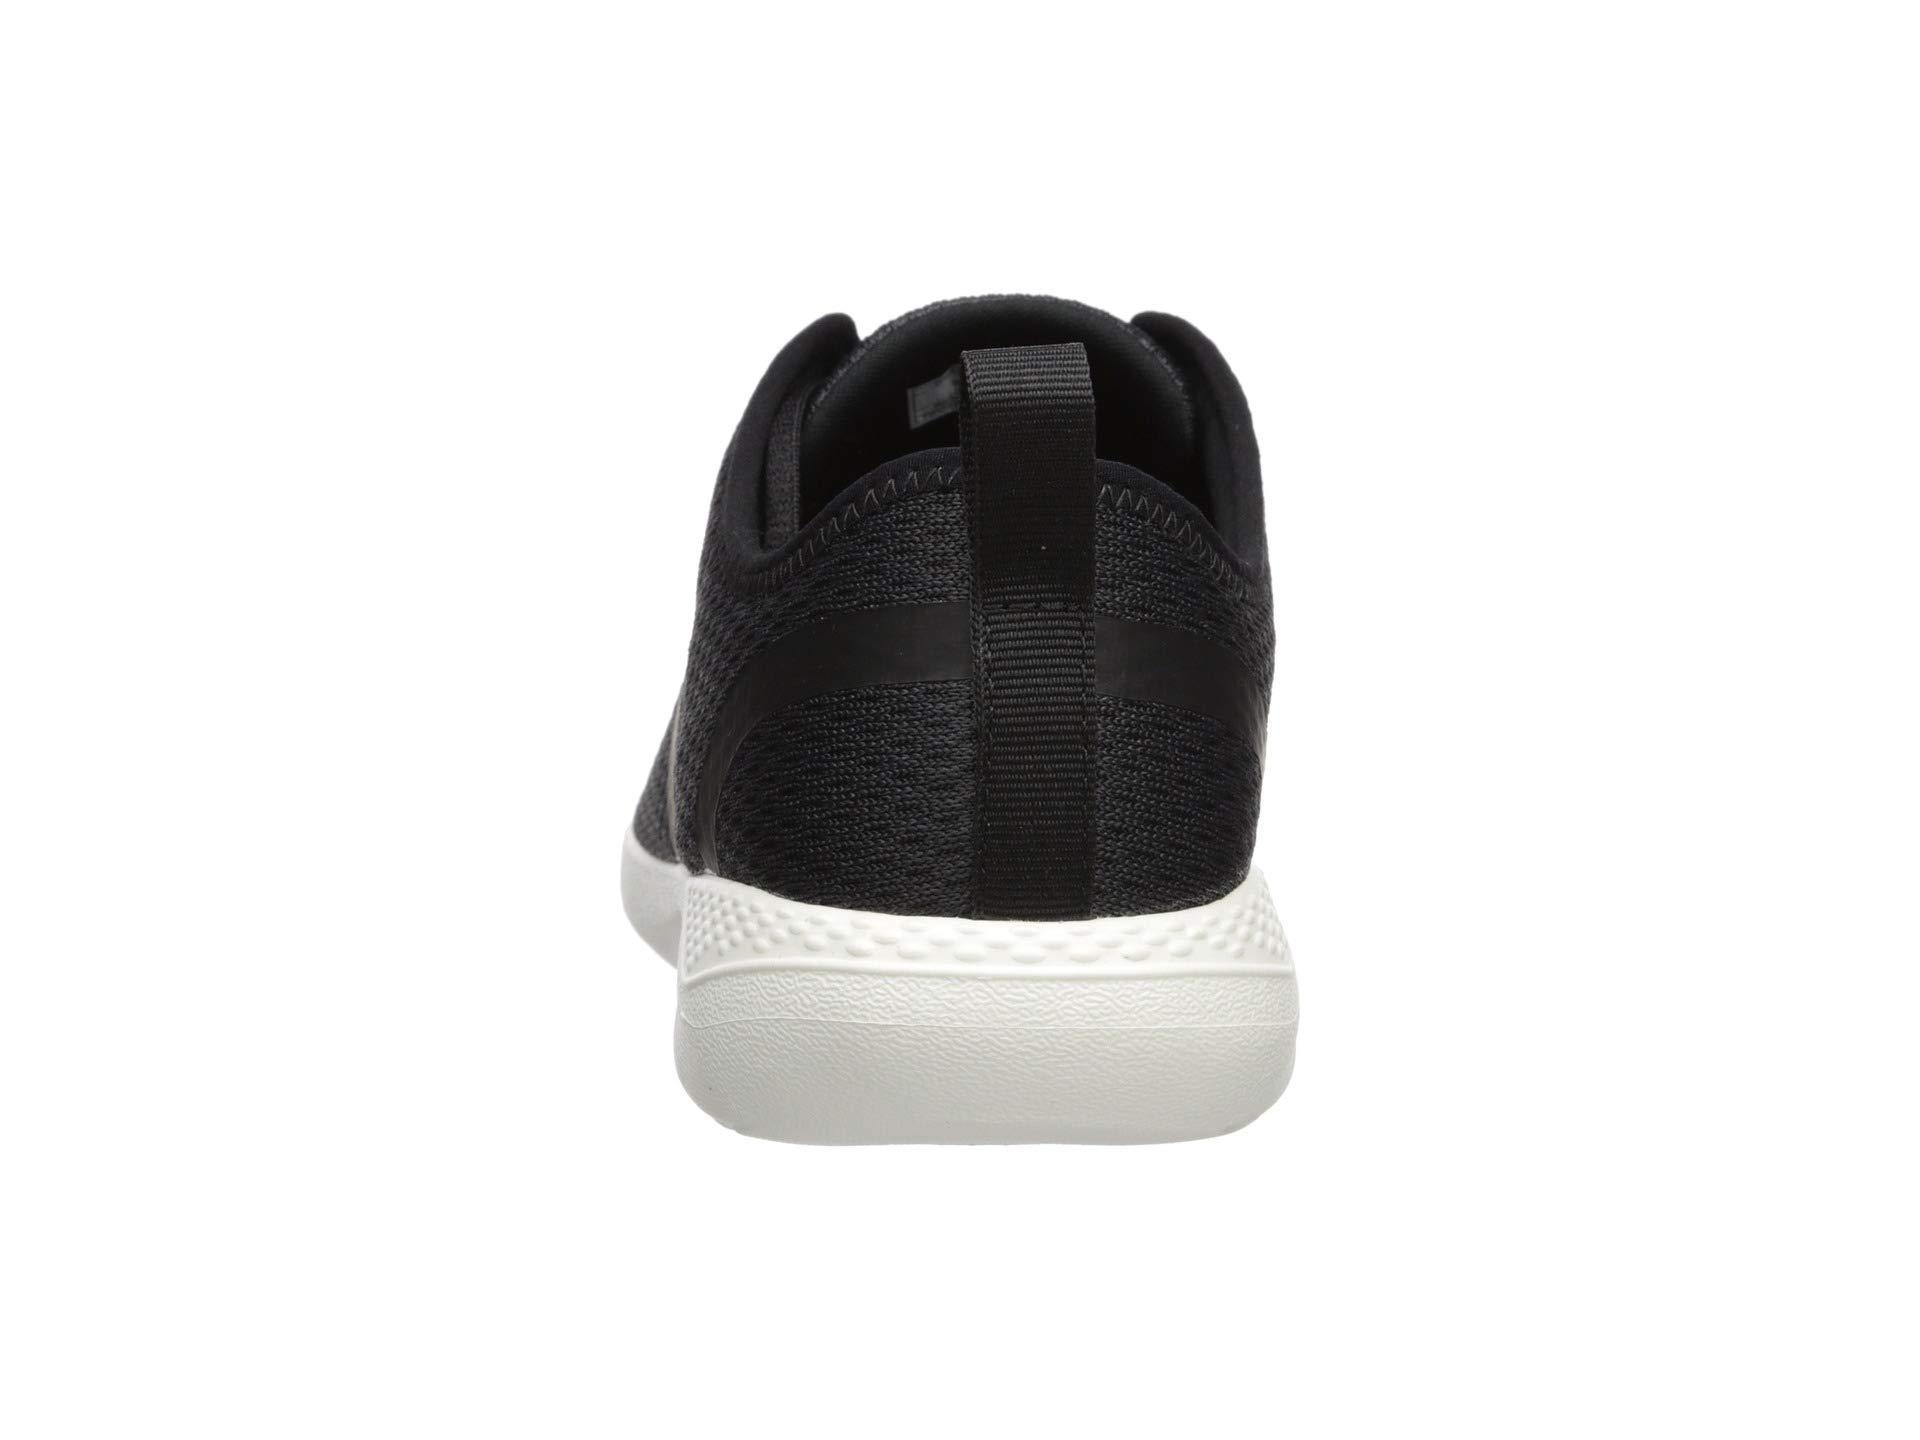 8dfd510c591c Lyst - Crocs™ Literide Mesh Lace (black white) Men s Shoes in Black for Men  - Save 19%